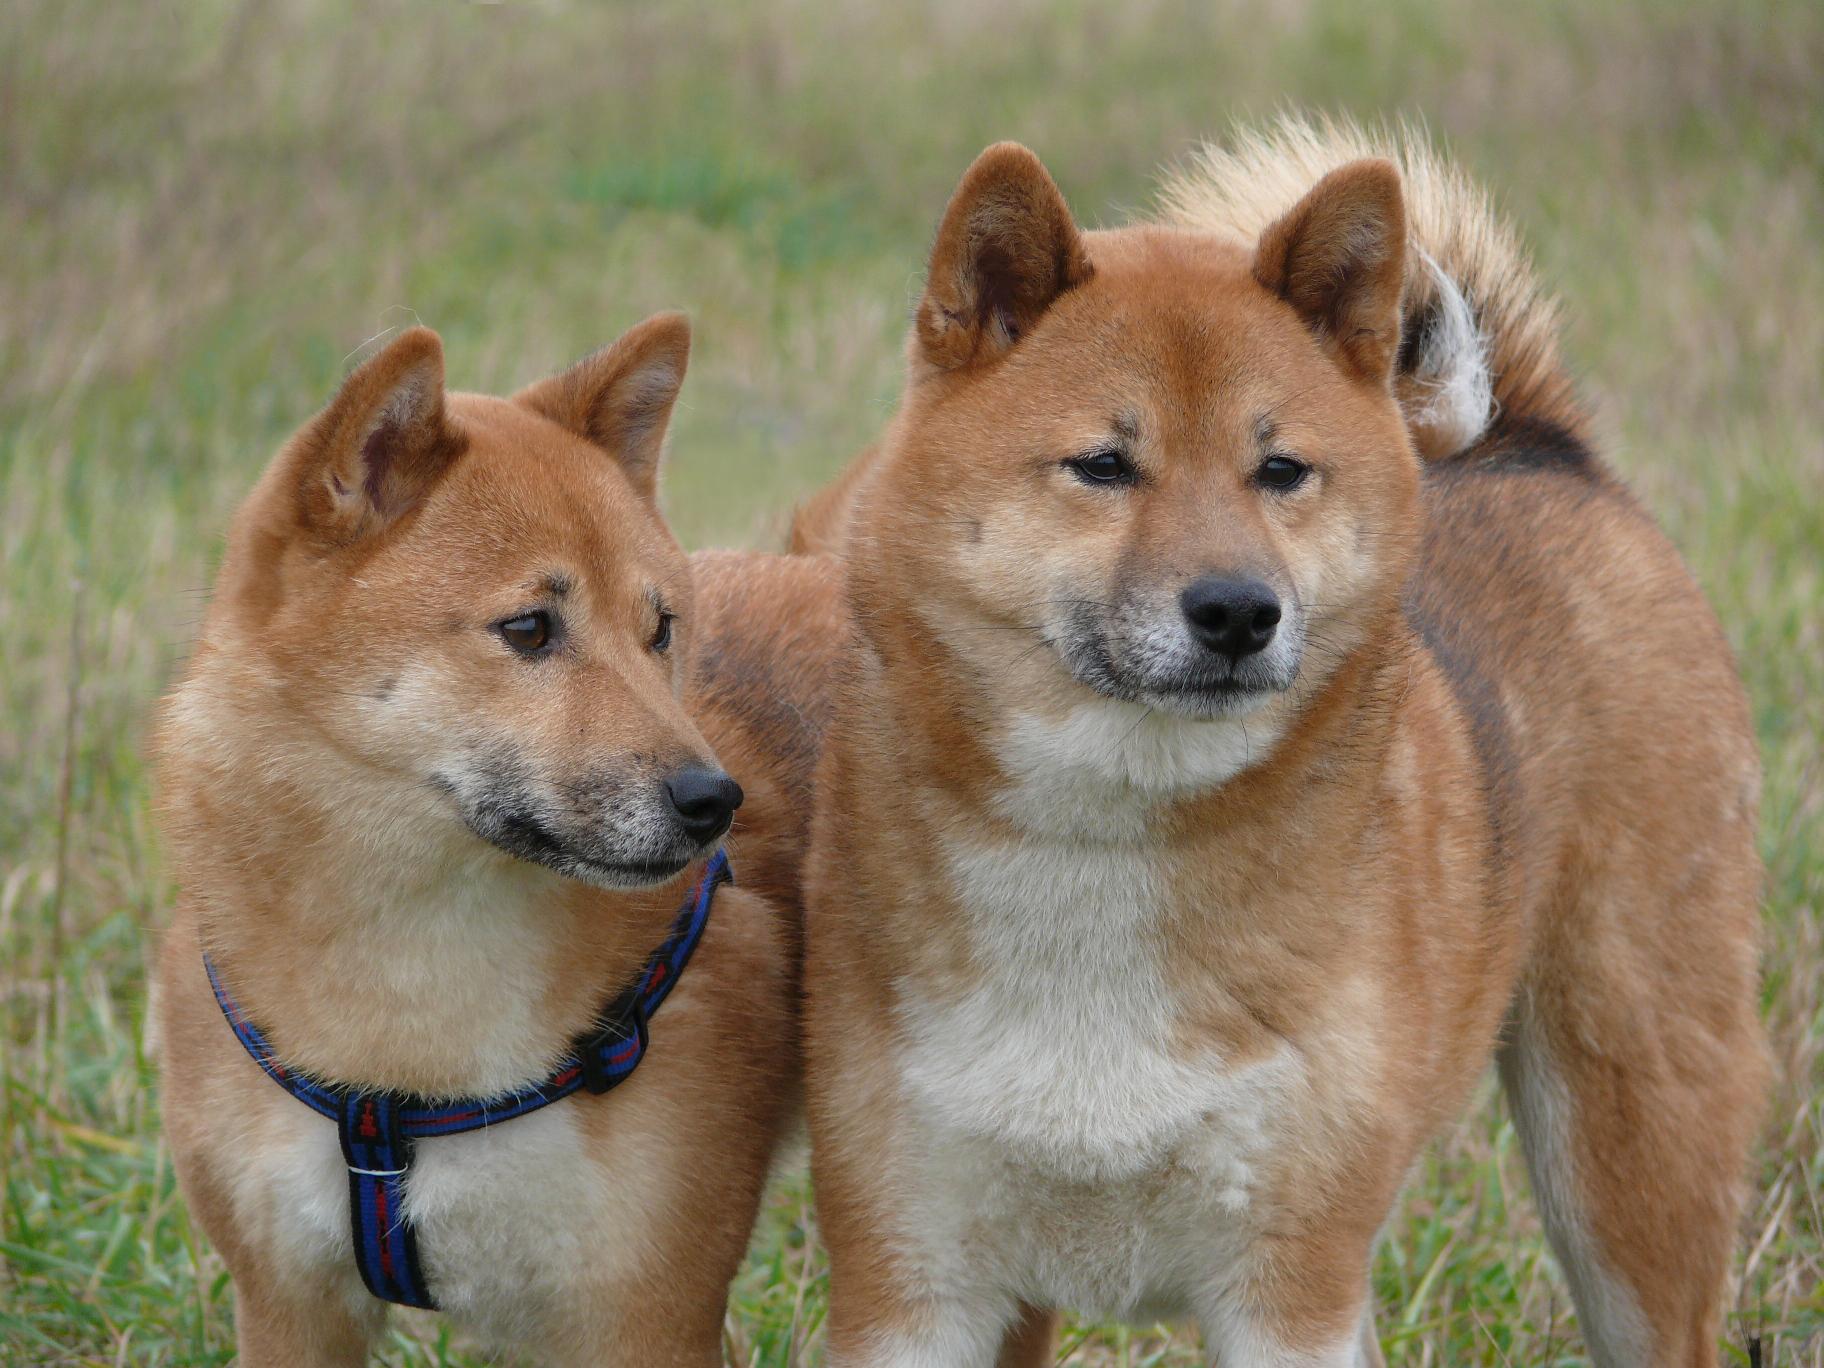 Deux Shiba Ini dans l'herbe